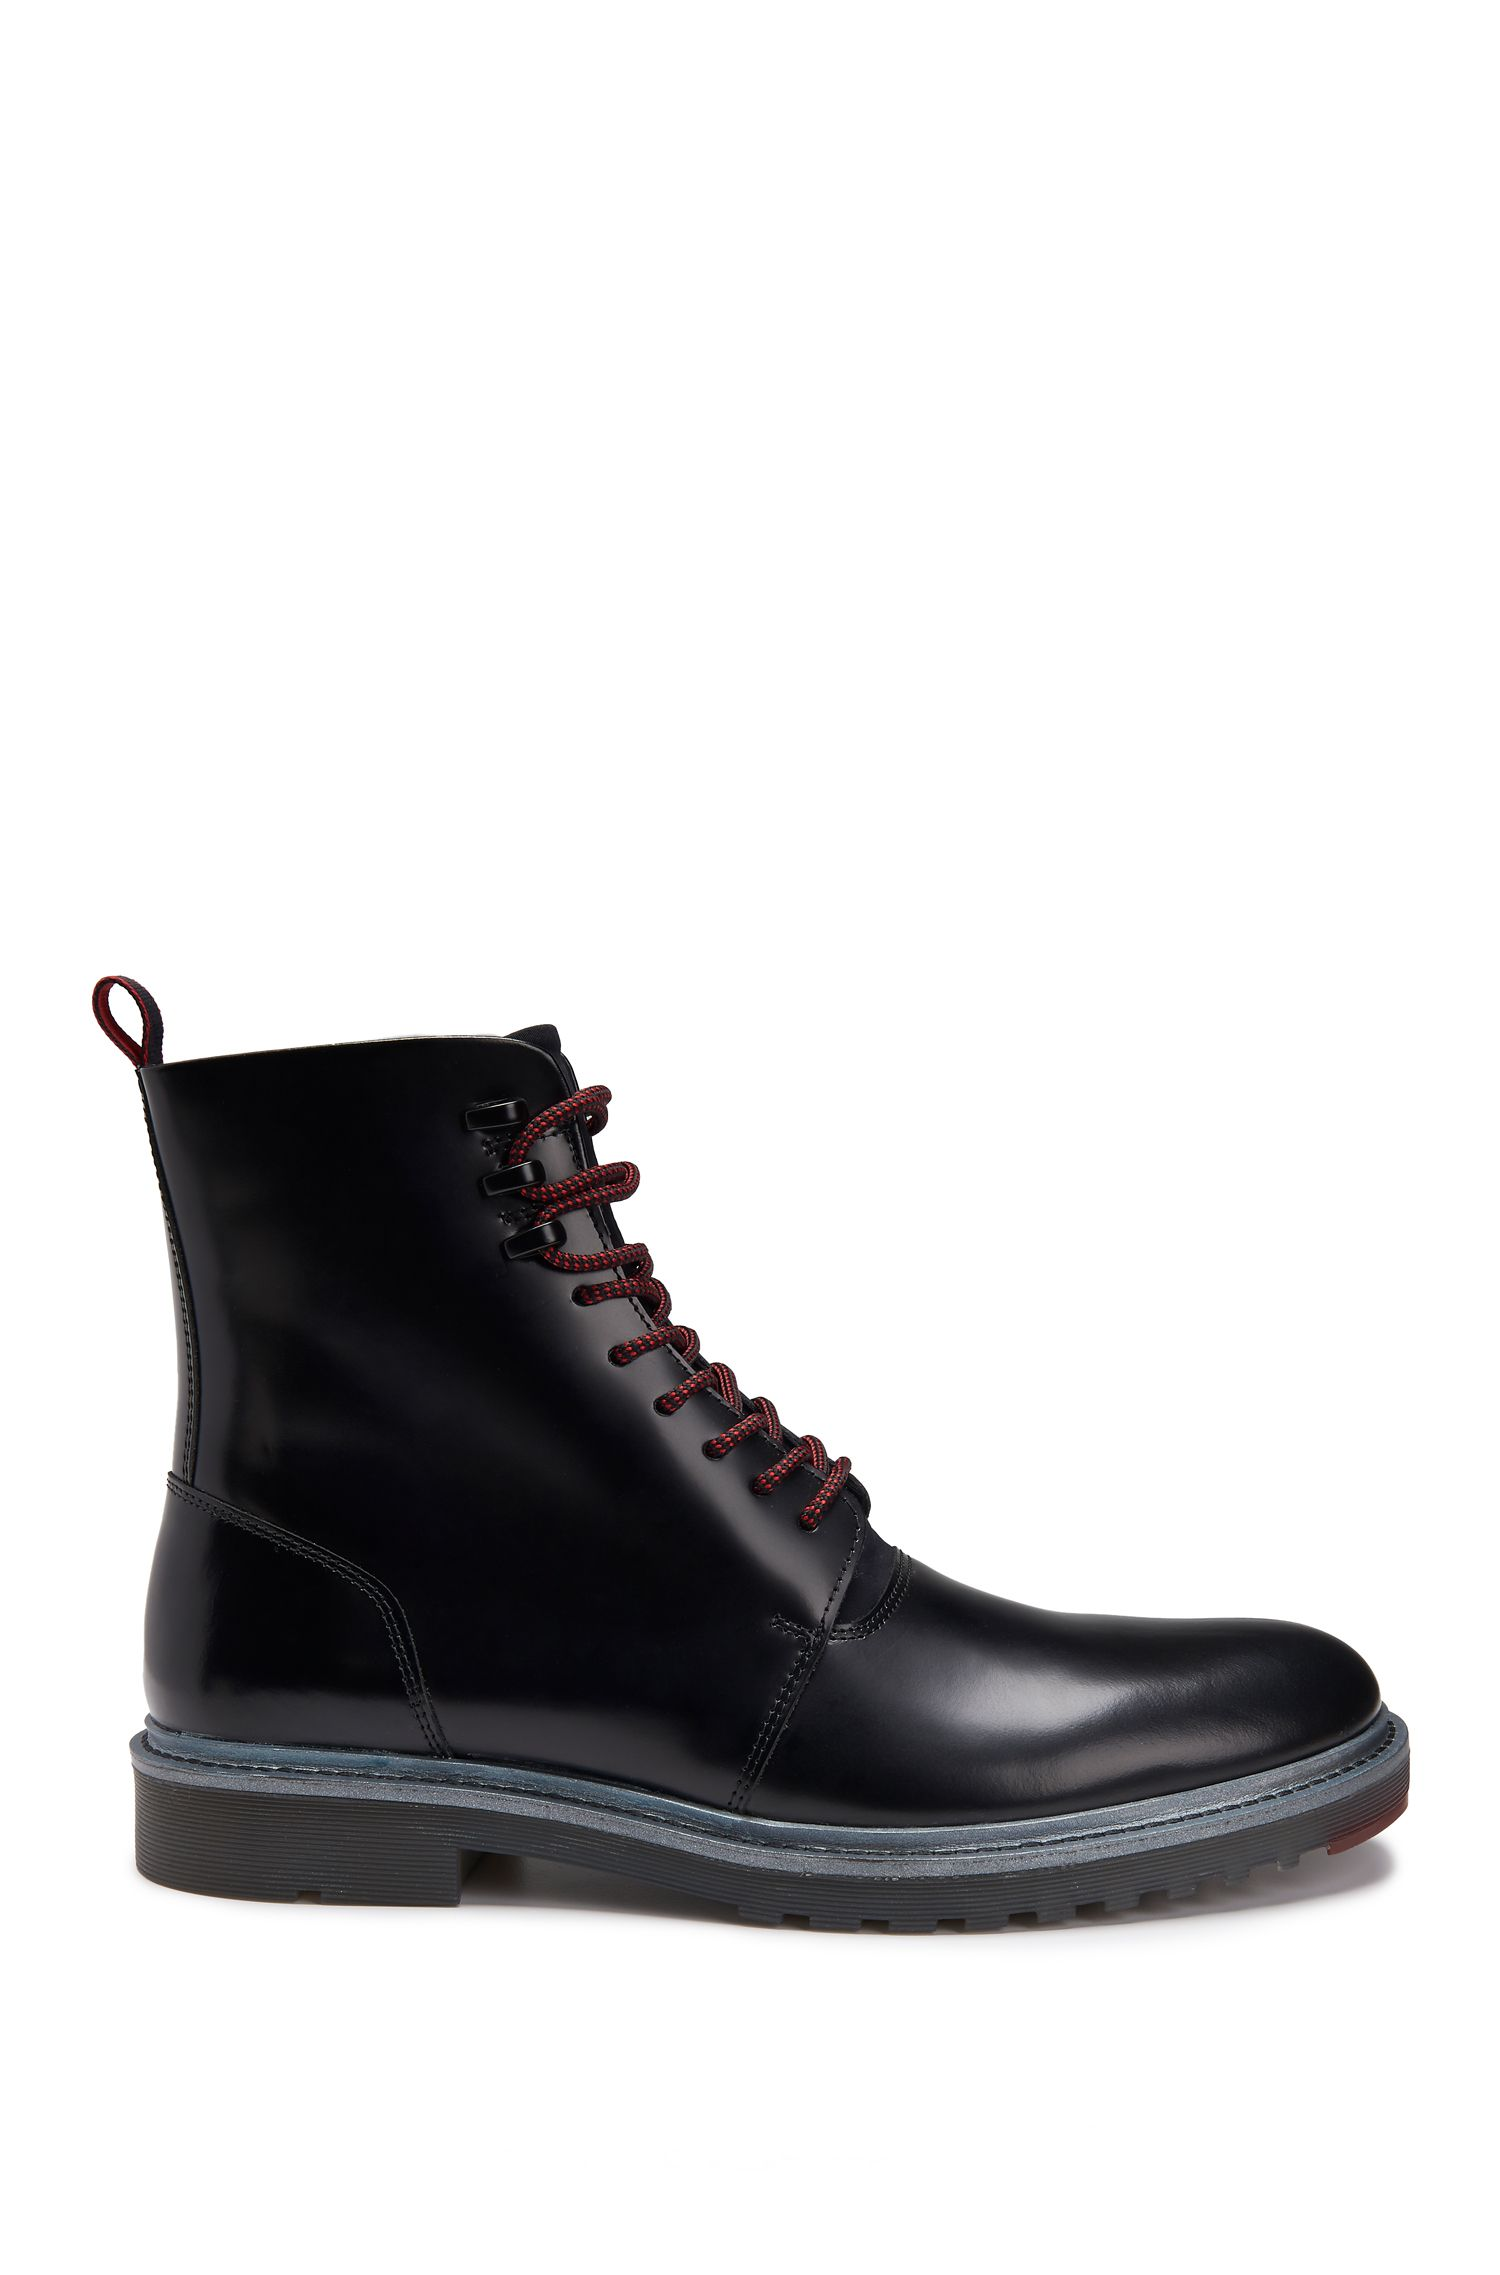 Leather Boot | Pure Halb Bonp, Black